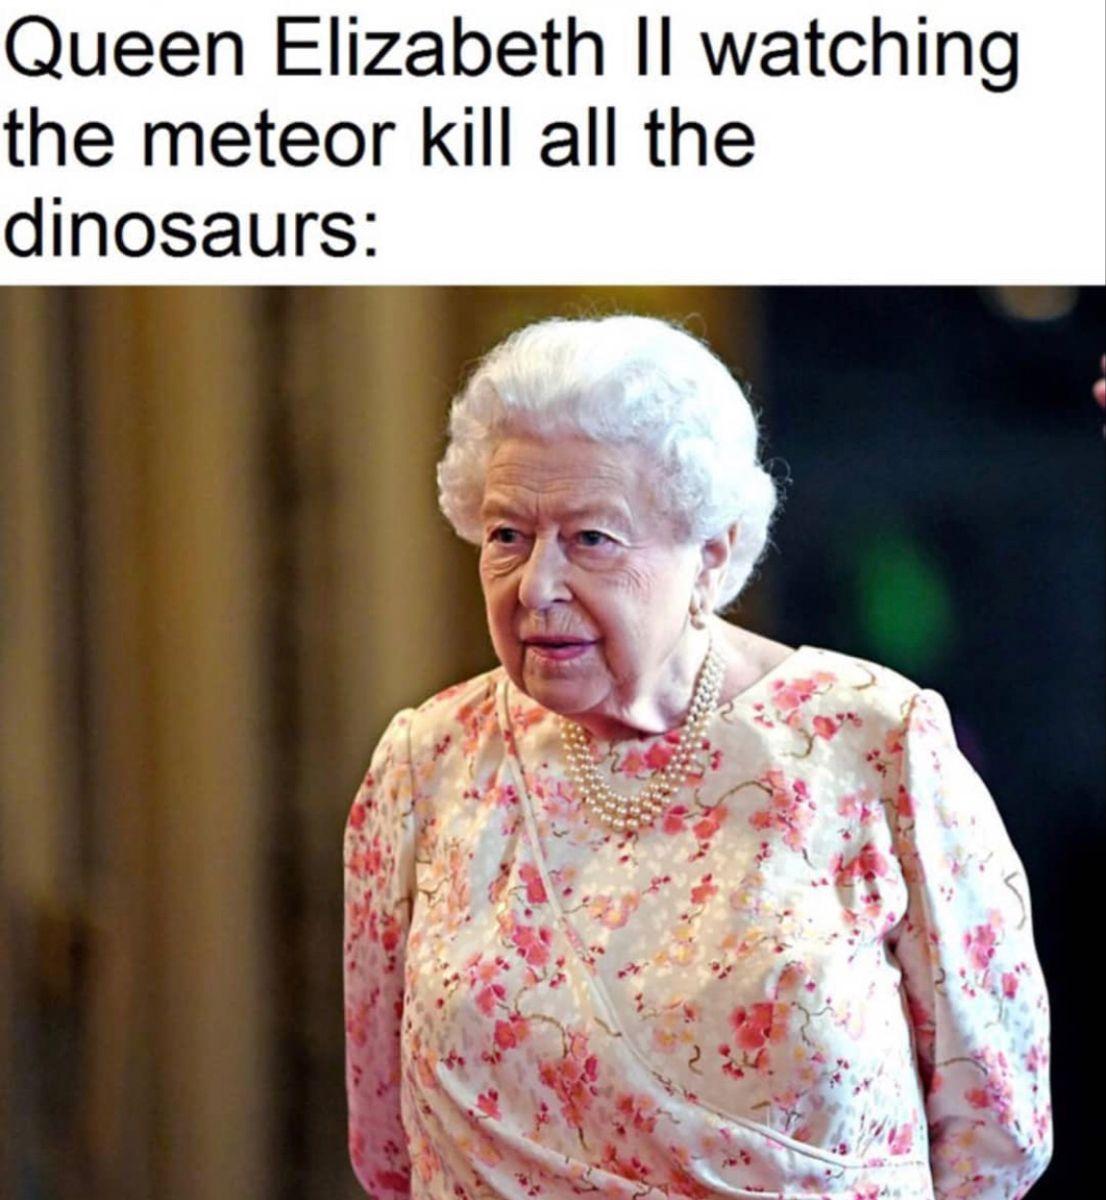 Pin By Haleigh On Queen Elizabeth Celebrity Memes Queen Elizabeth Memes Queen Elizabeth